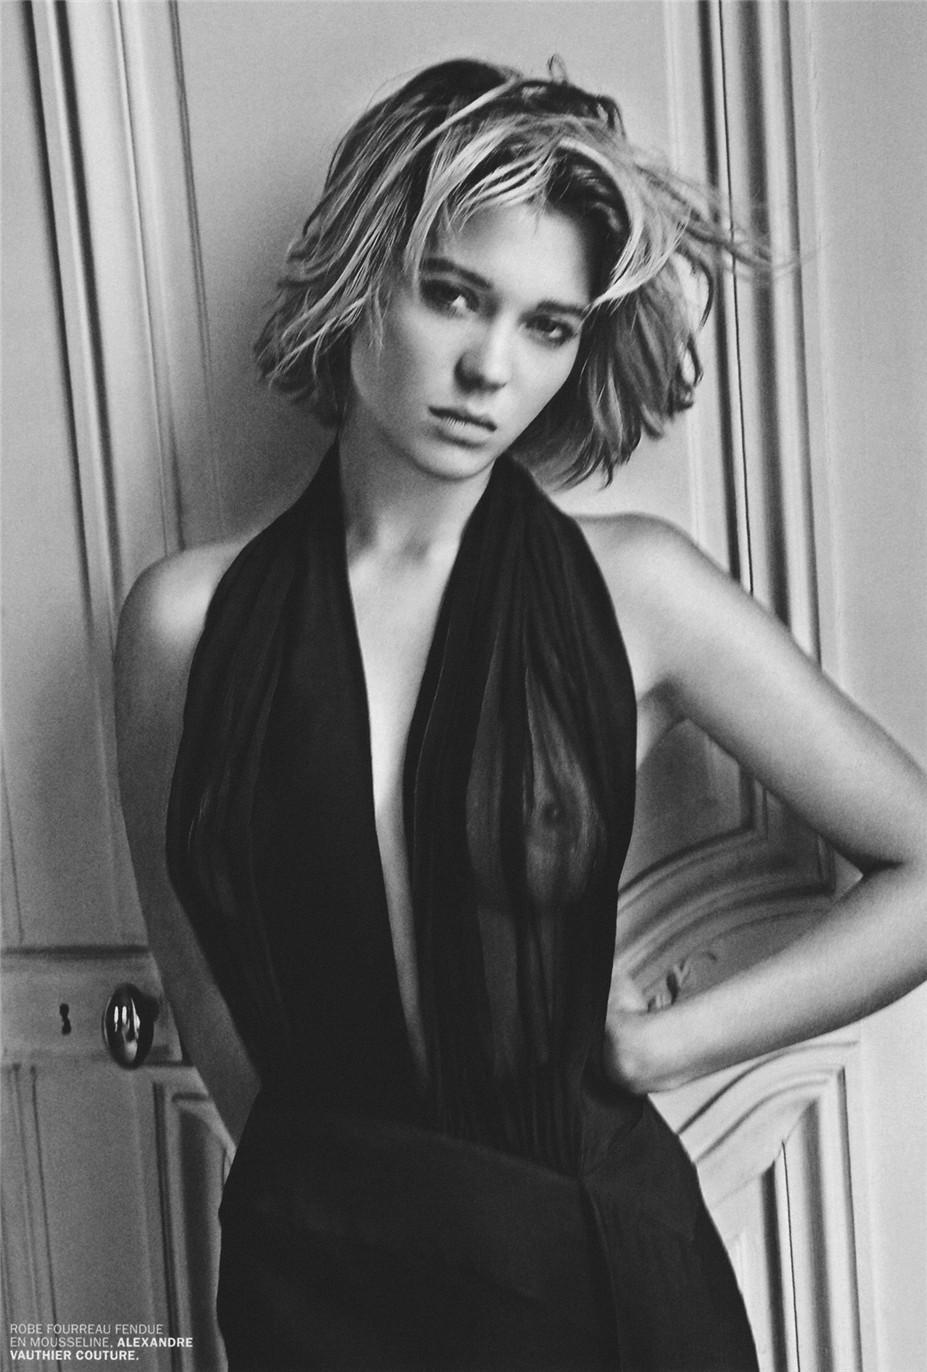 Эротические фотографии французской актрисы Леа Сейду / Lea Seydoux by Mario Sorrenti for Lui Magazine No.1 september 2013